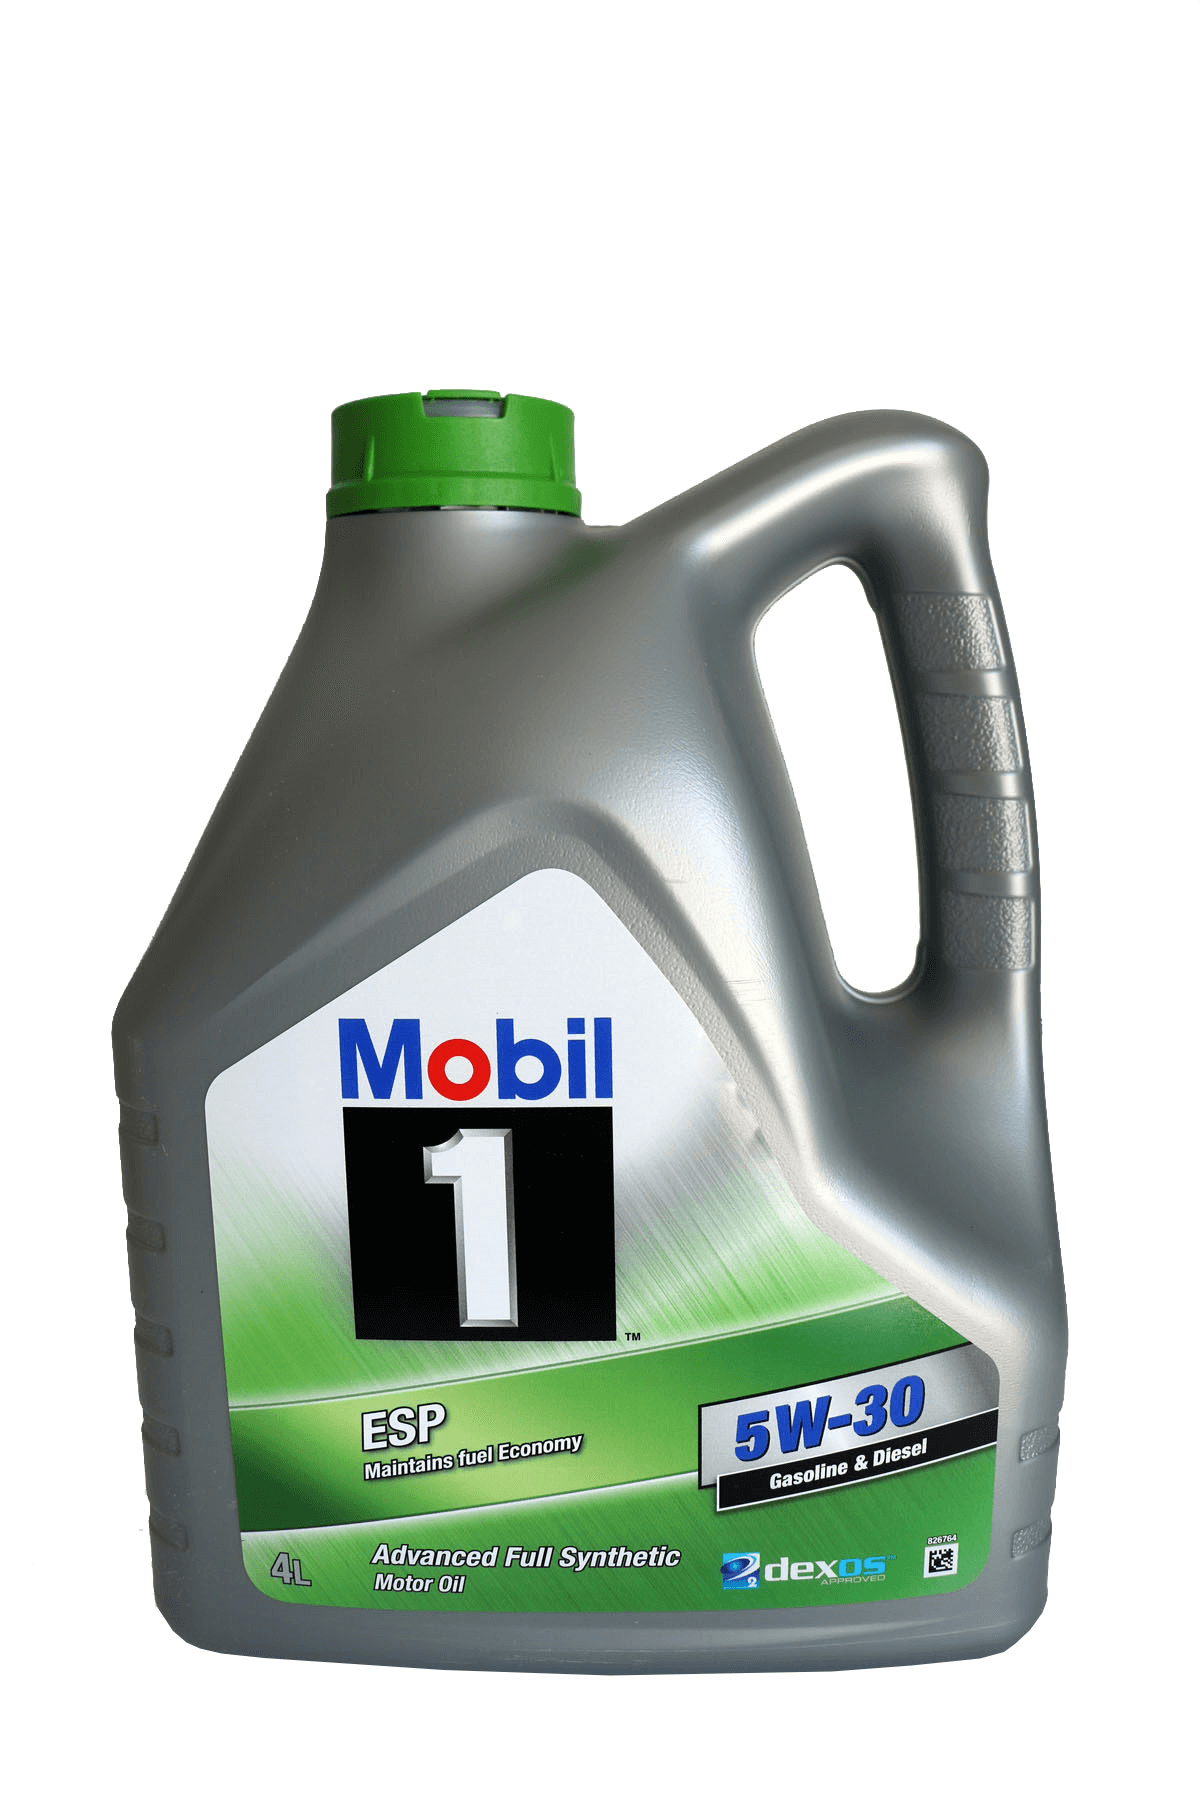 Mobil 1 ESP 5W-30 Motoröl, 4l